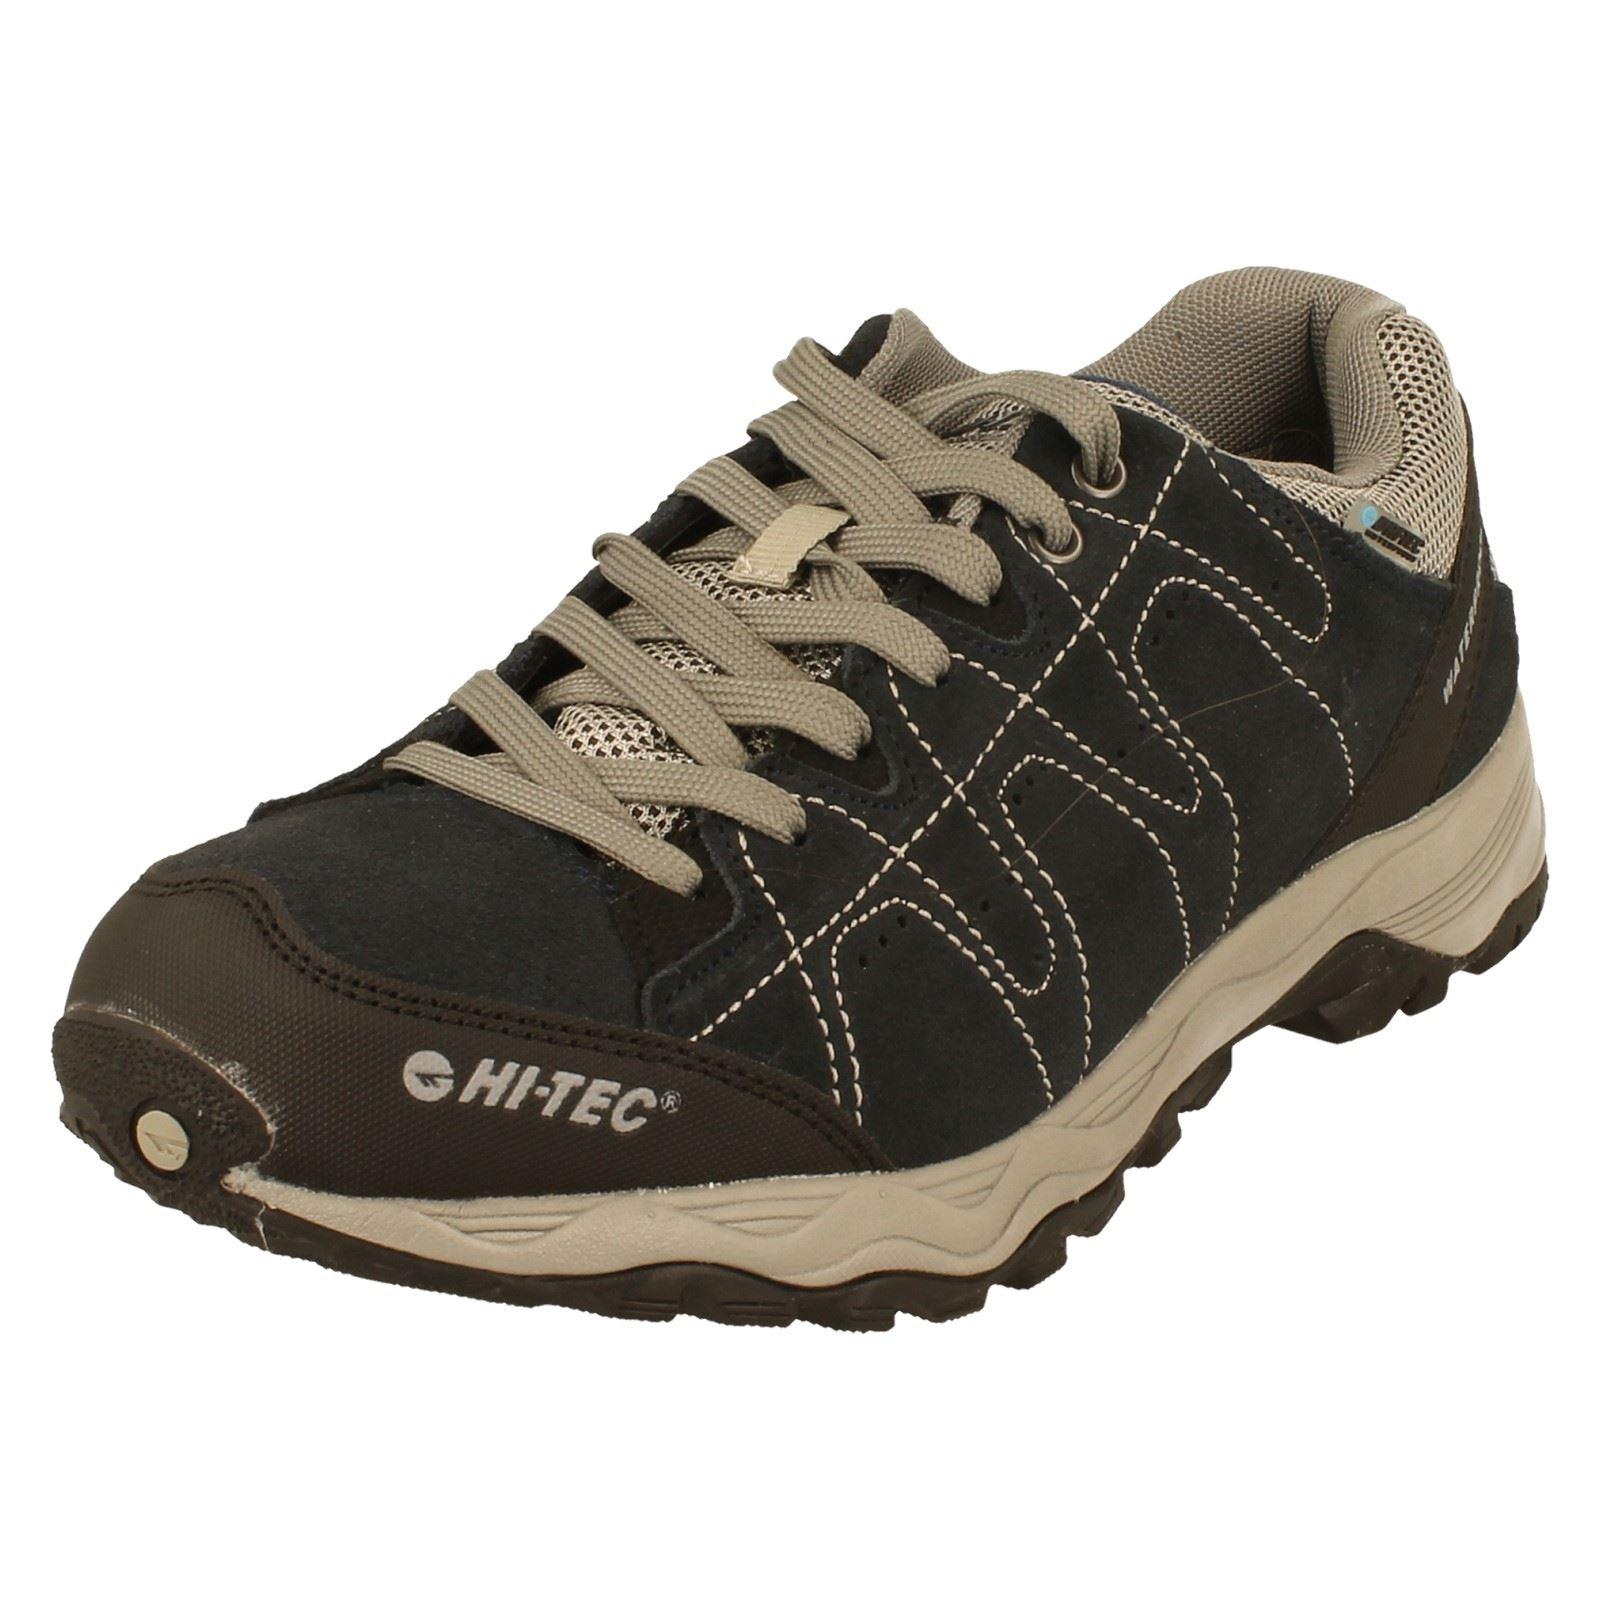 Uomo Hi Tec II Walking Trainers  Libero II Tec Wp-W 7e9794